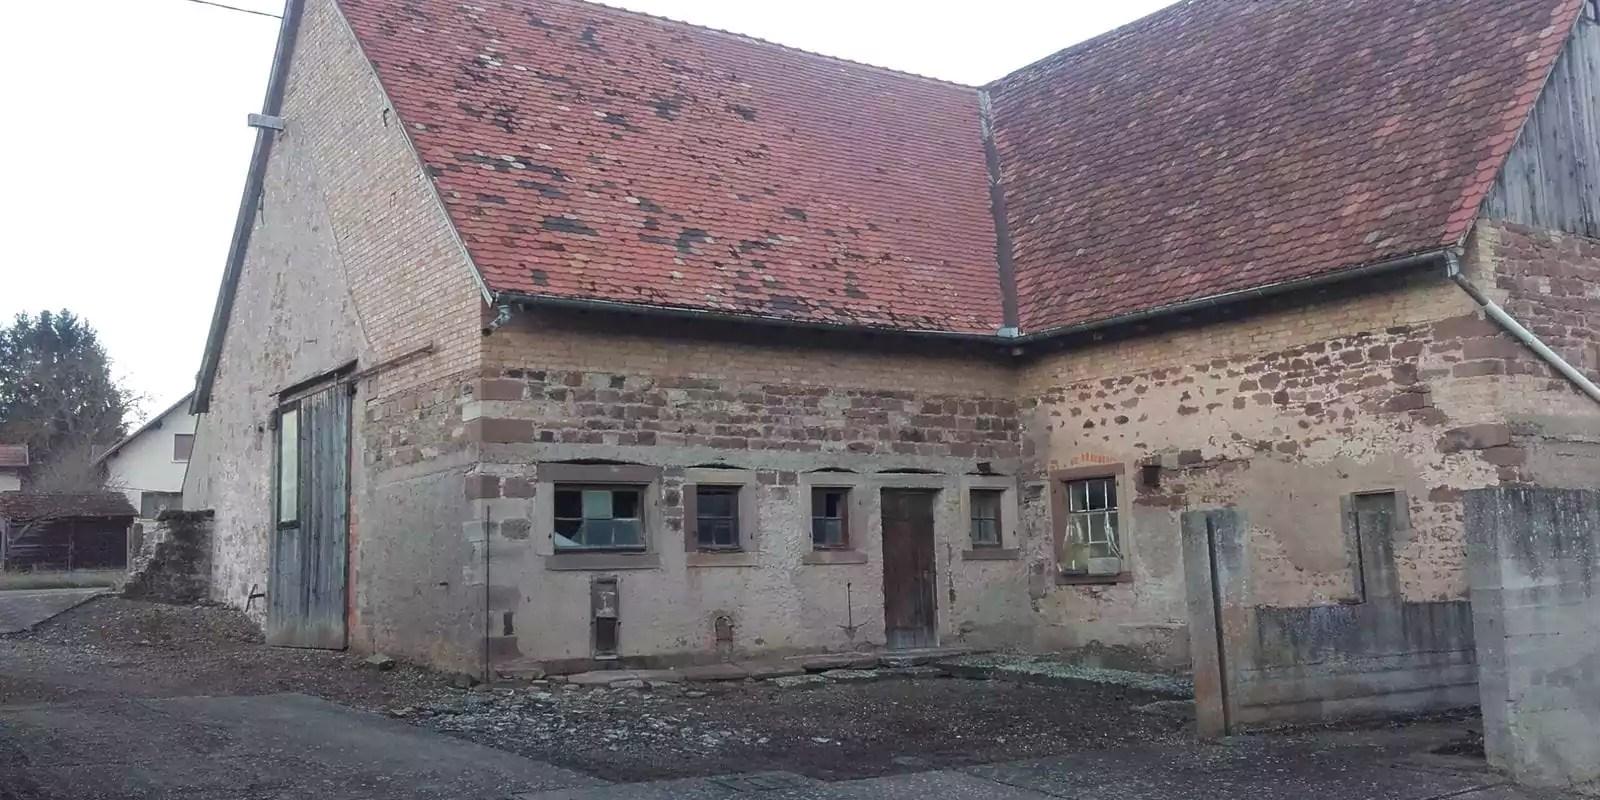 Aidez la brasserie de Niederhausbergen à se relocaliser